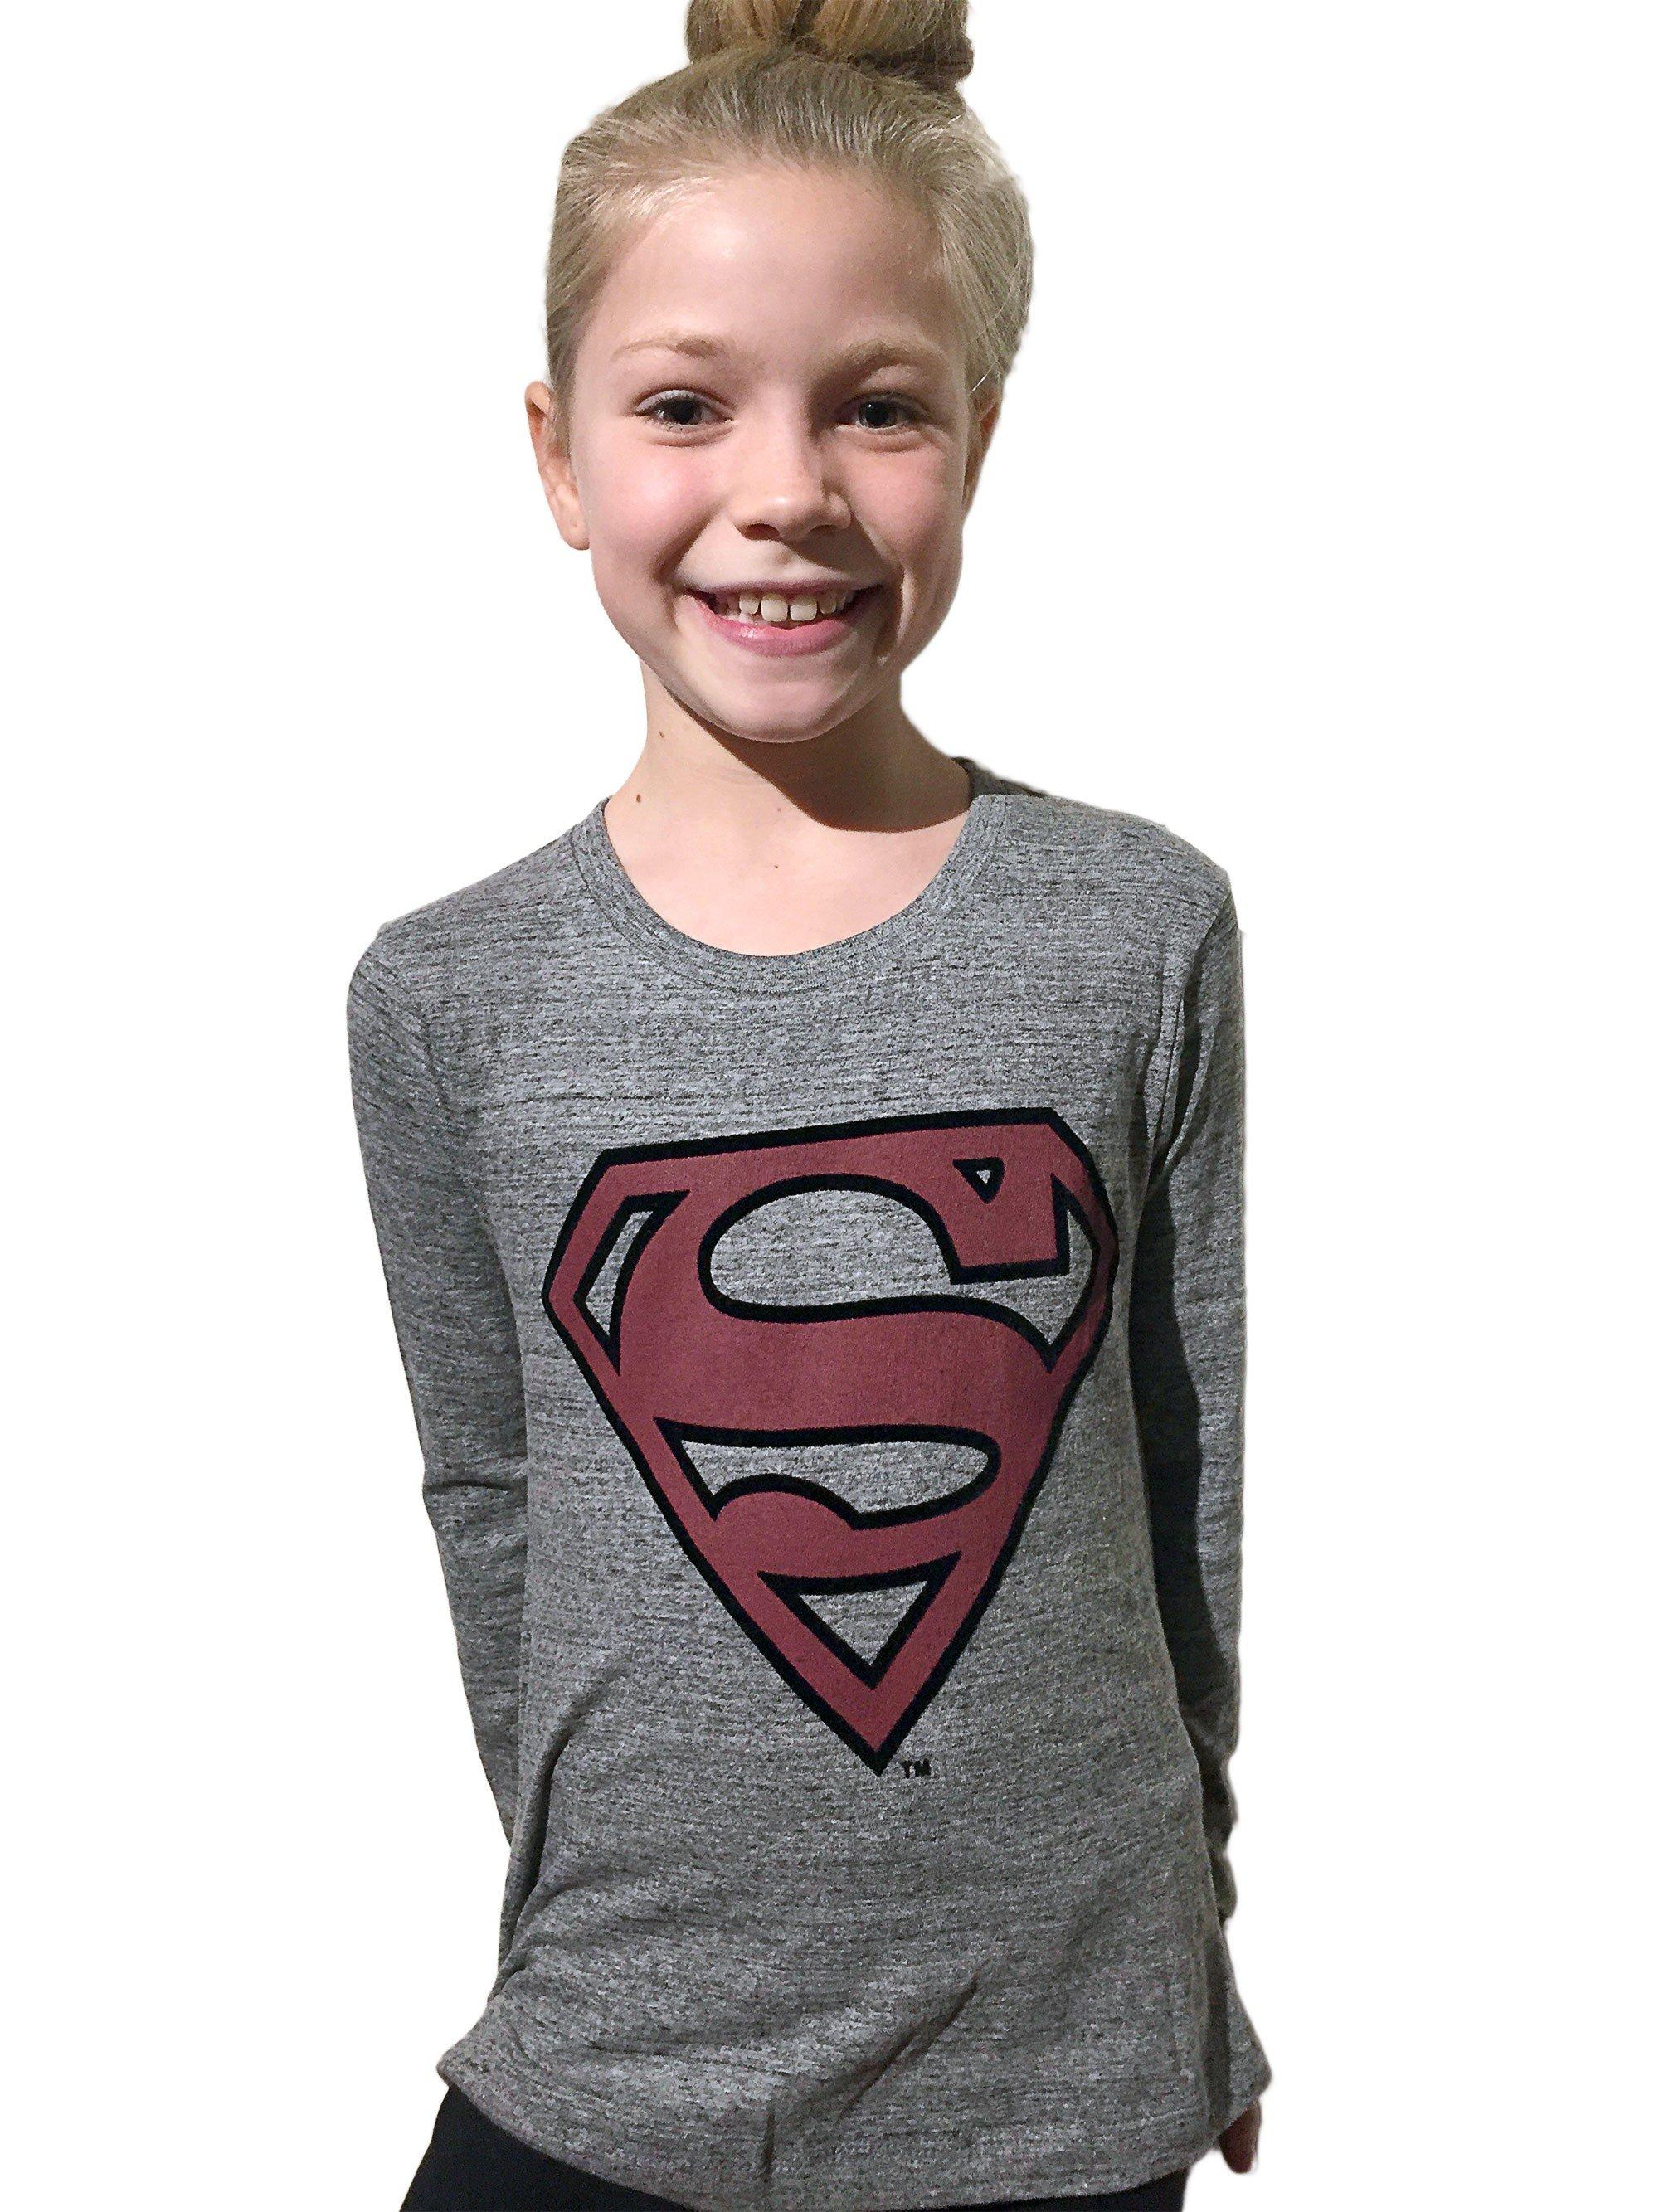 Little Eleven Paris - SUPERMAN - Long Sleeve Tee